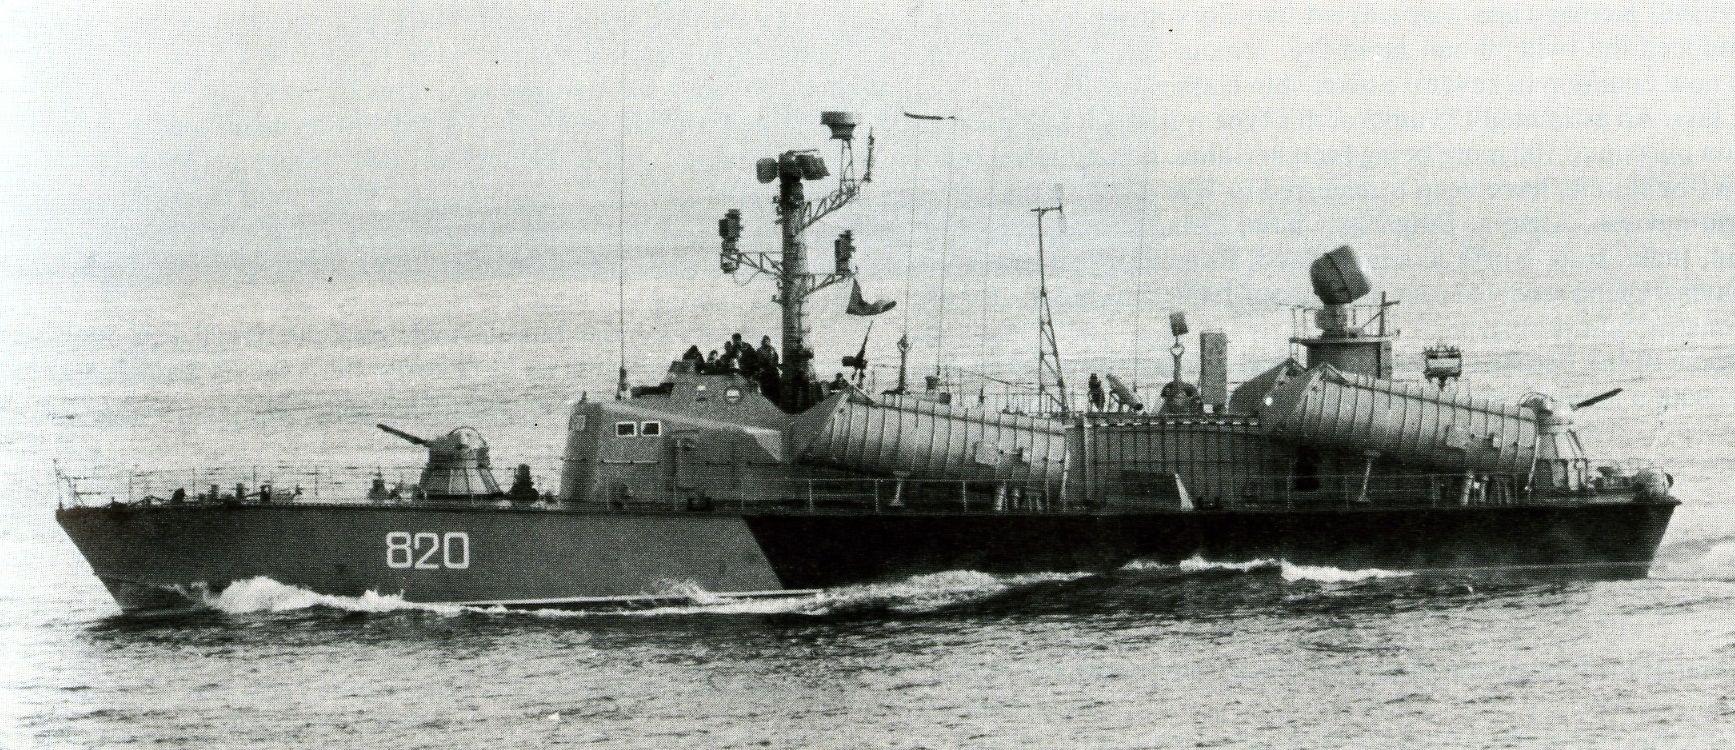 205У с НАРС и ПЗРК_ДКБФ_1989.jpg